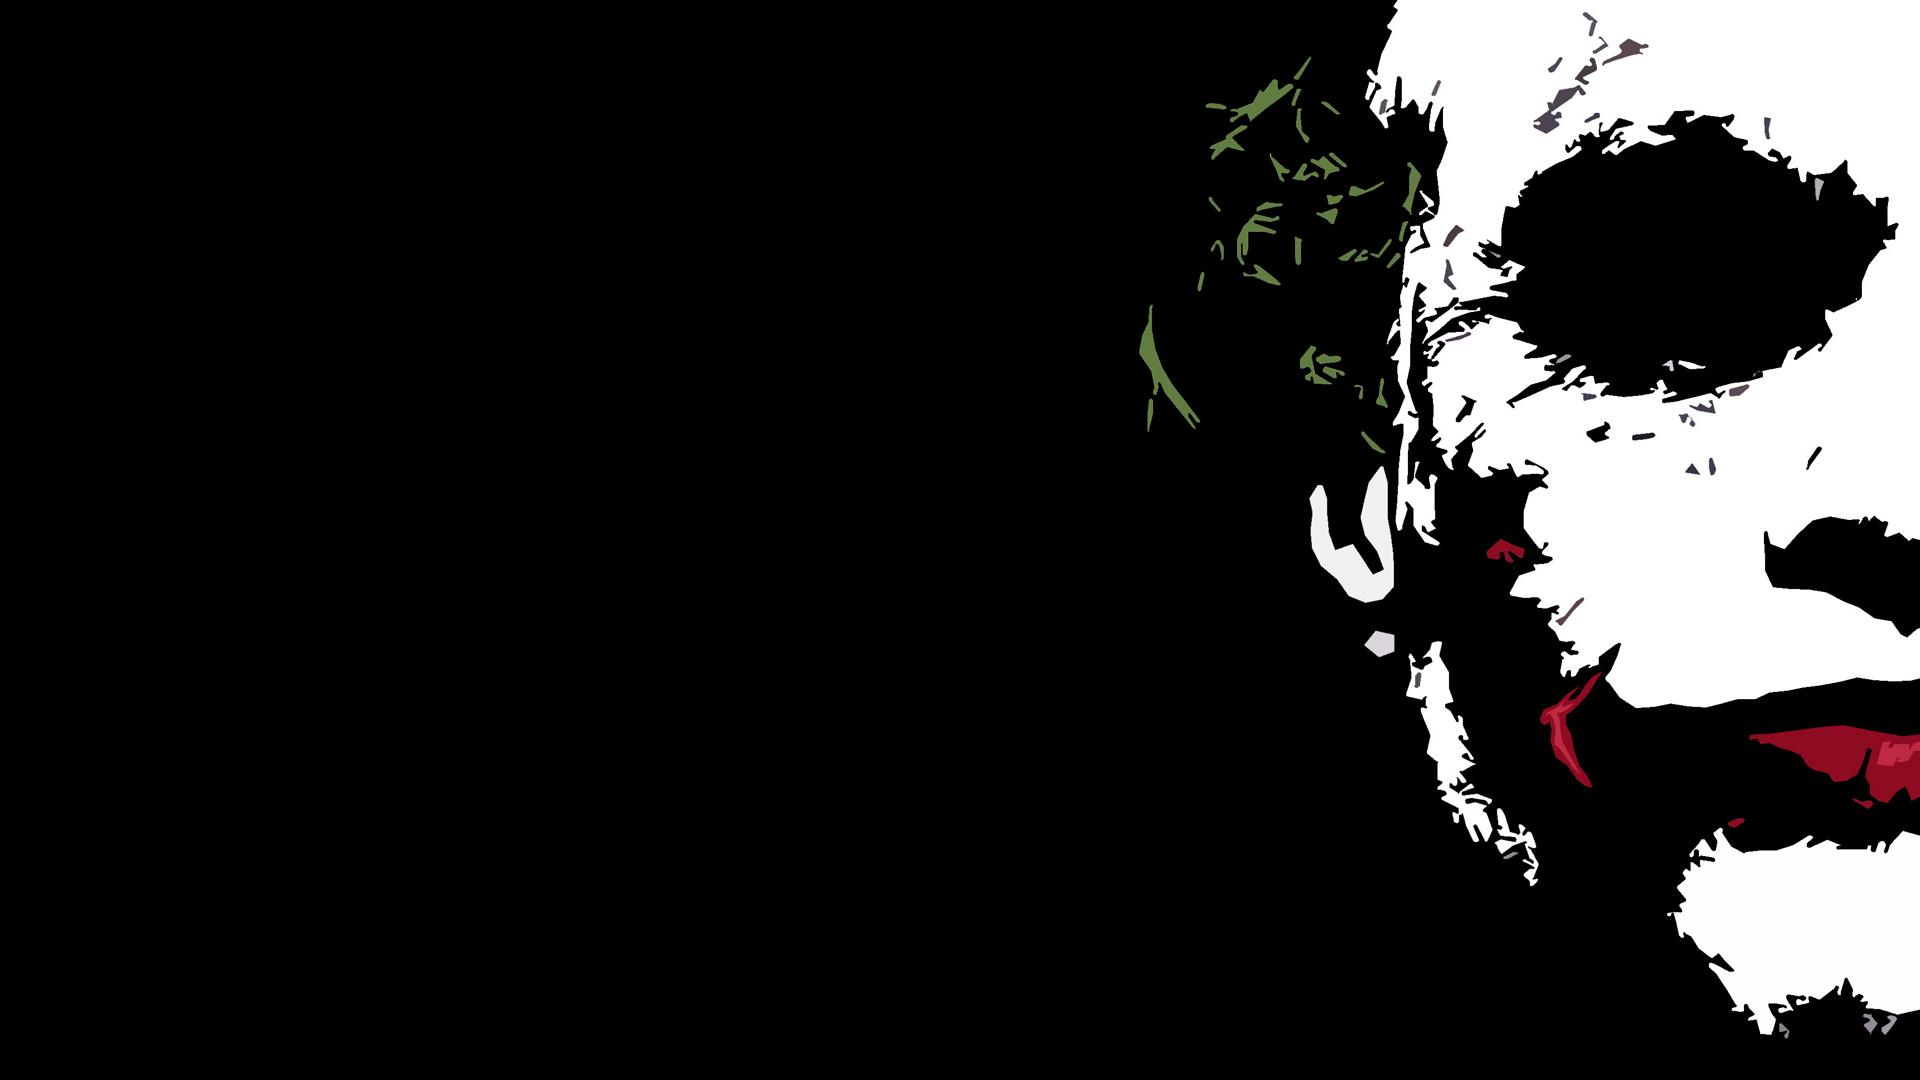 Joker Wallpaper Background 33337 1920x1080